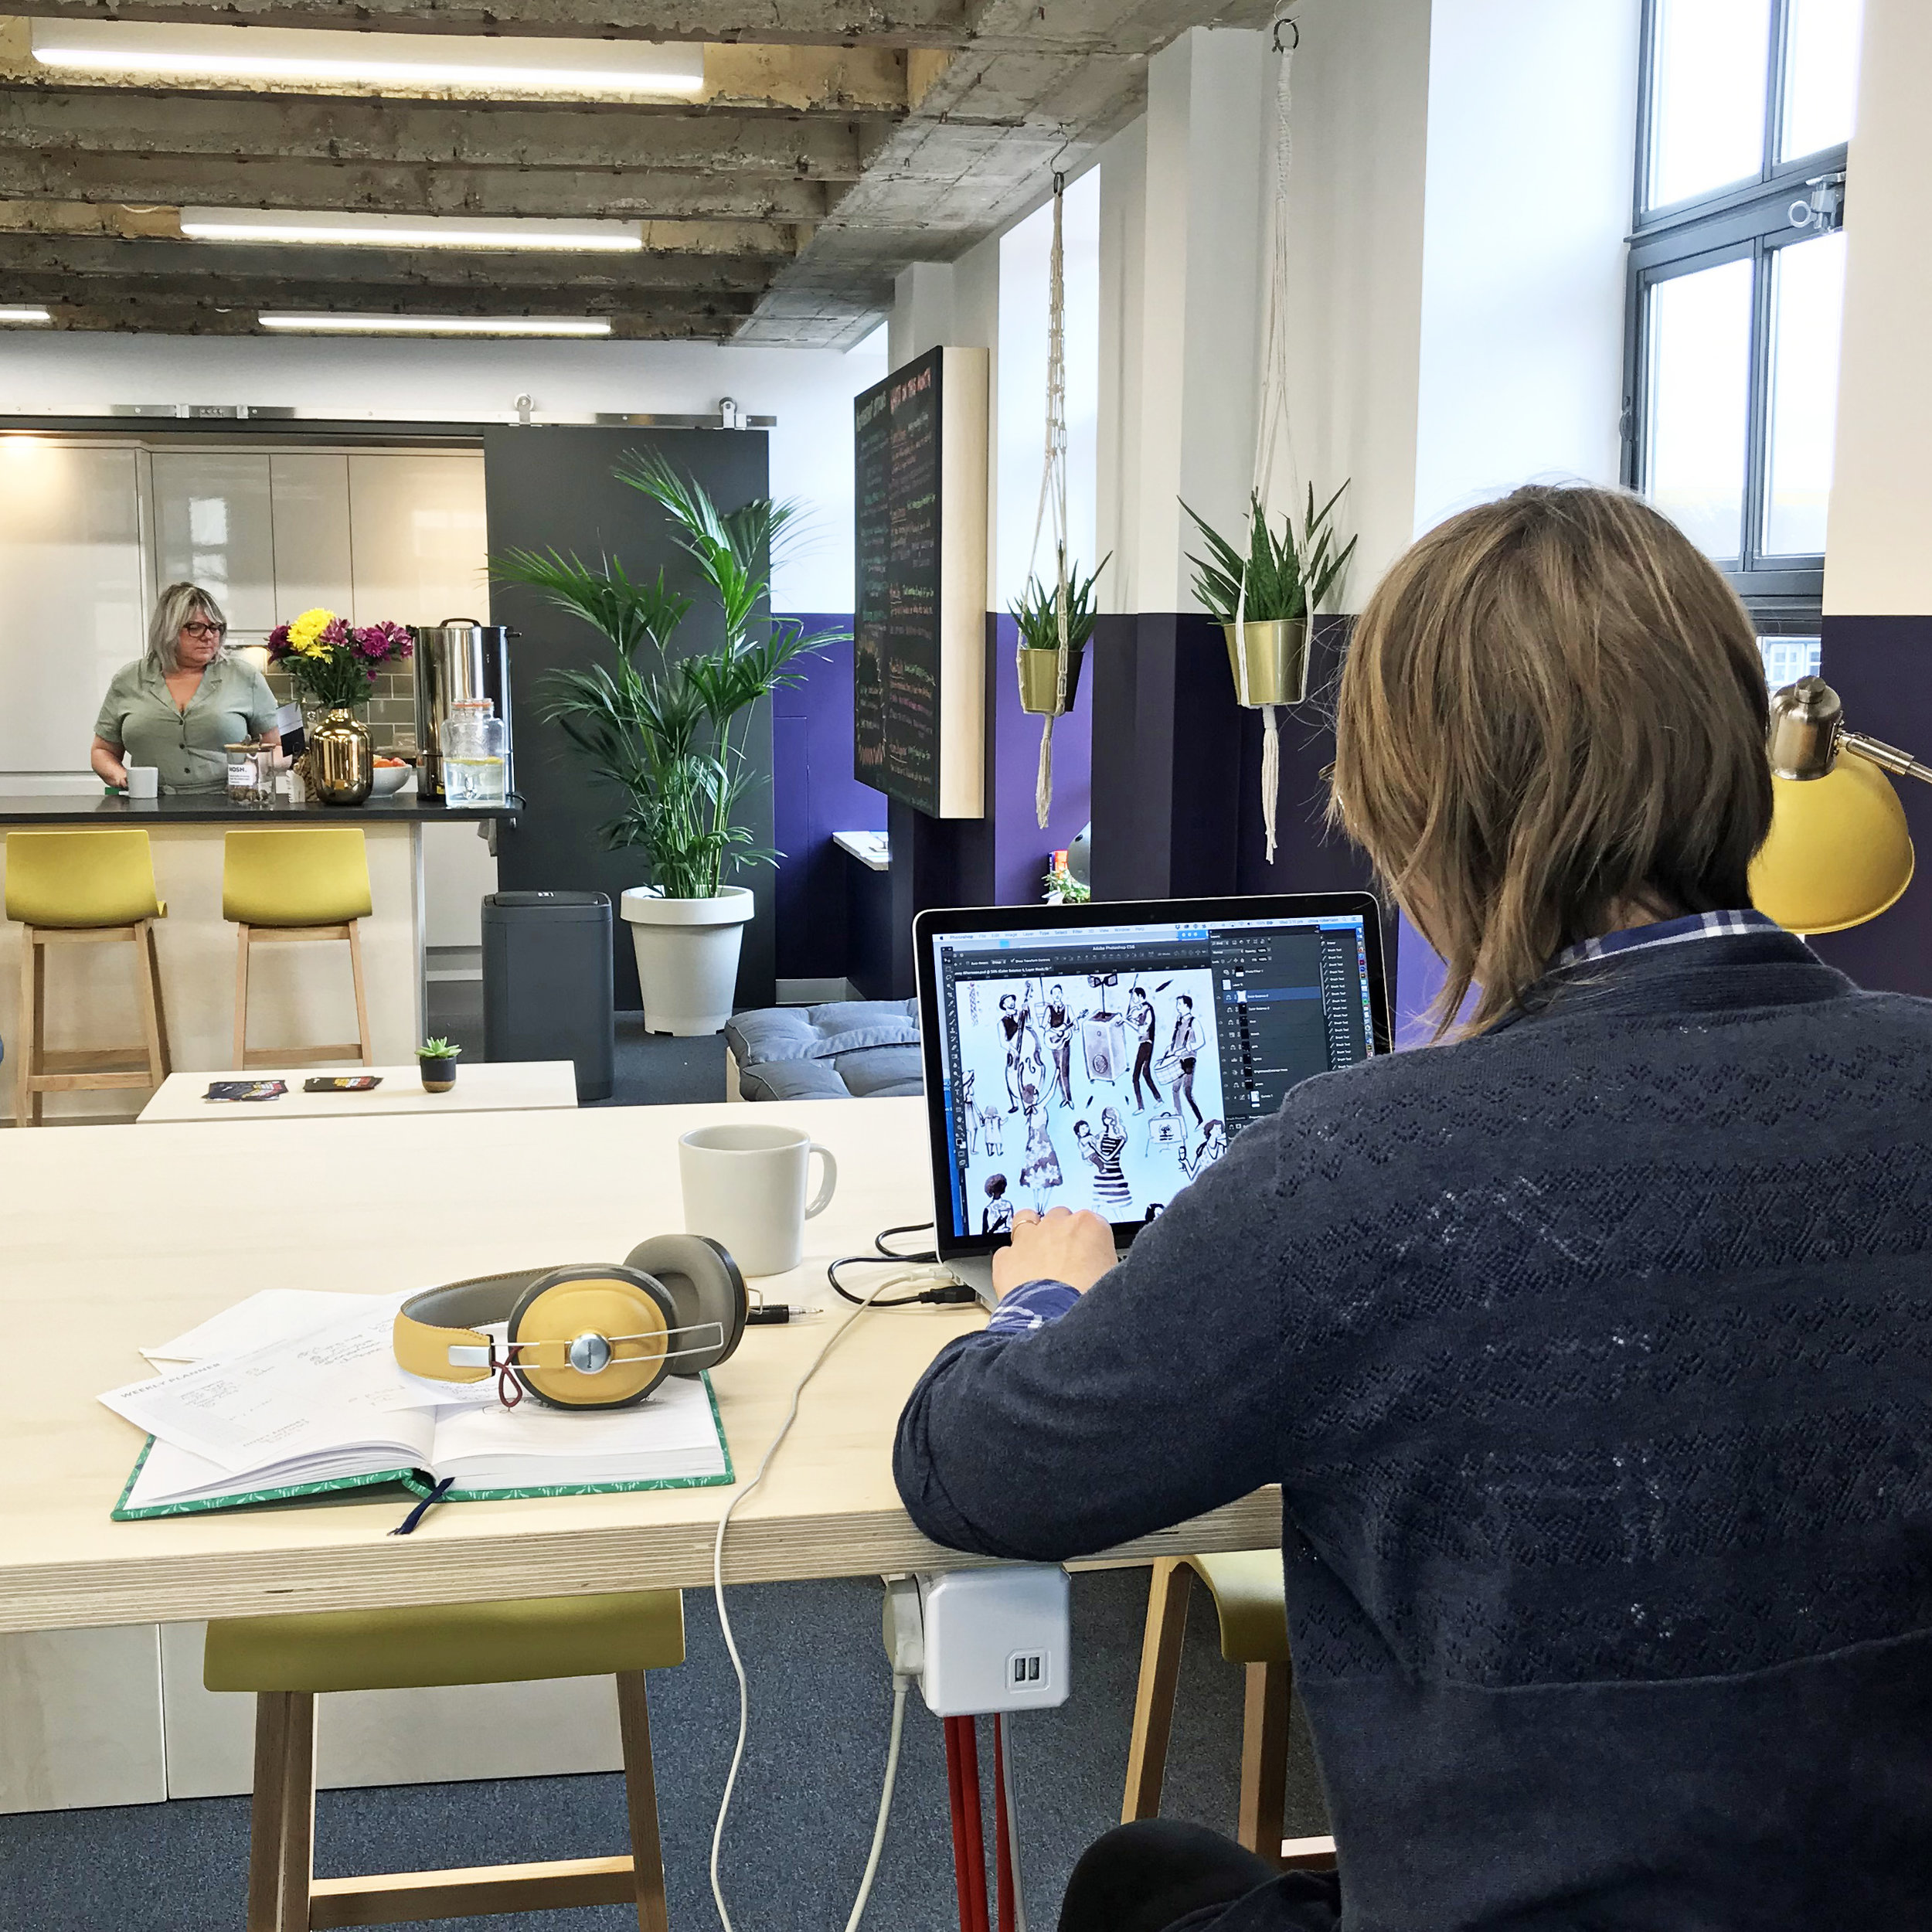 Lady hotdesking at Rume2 Coworkingspace